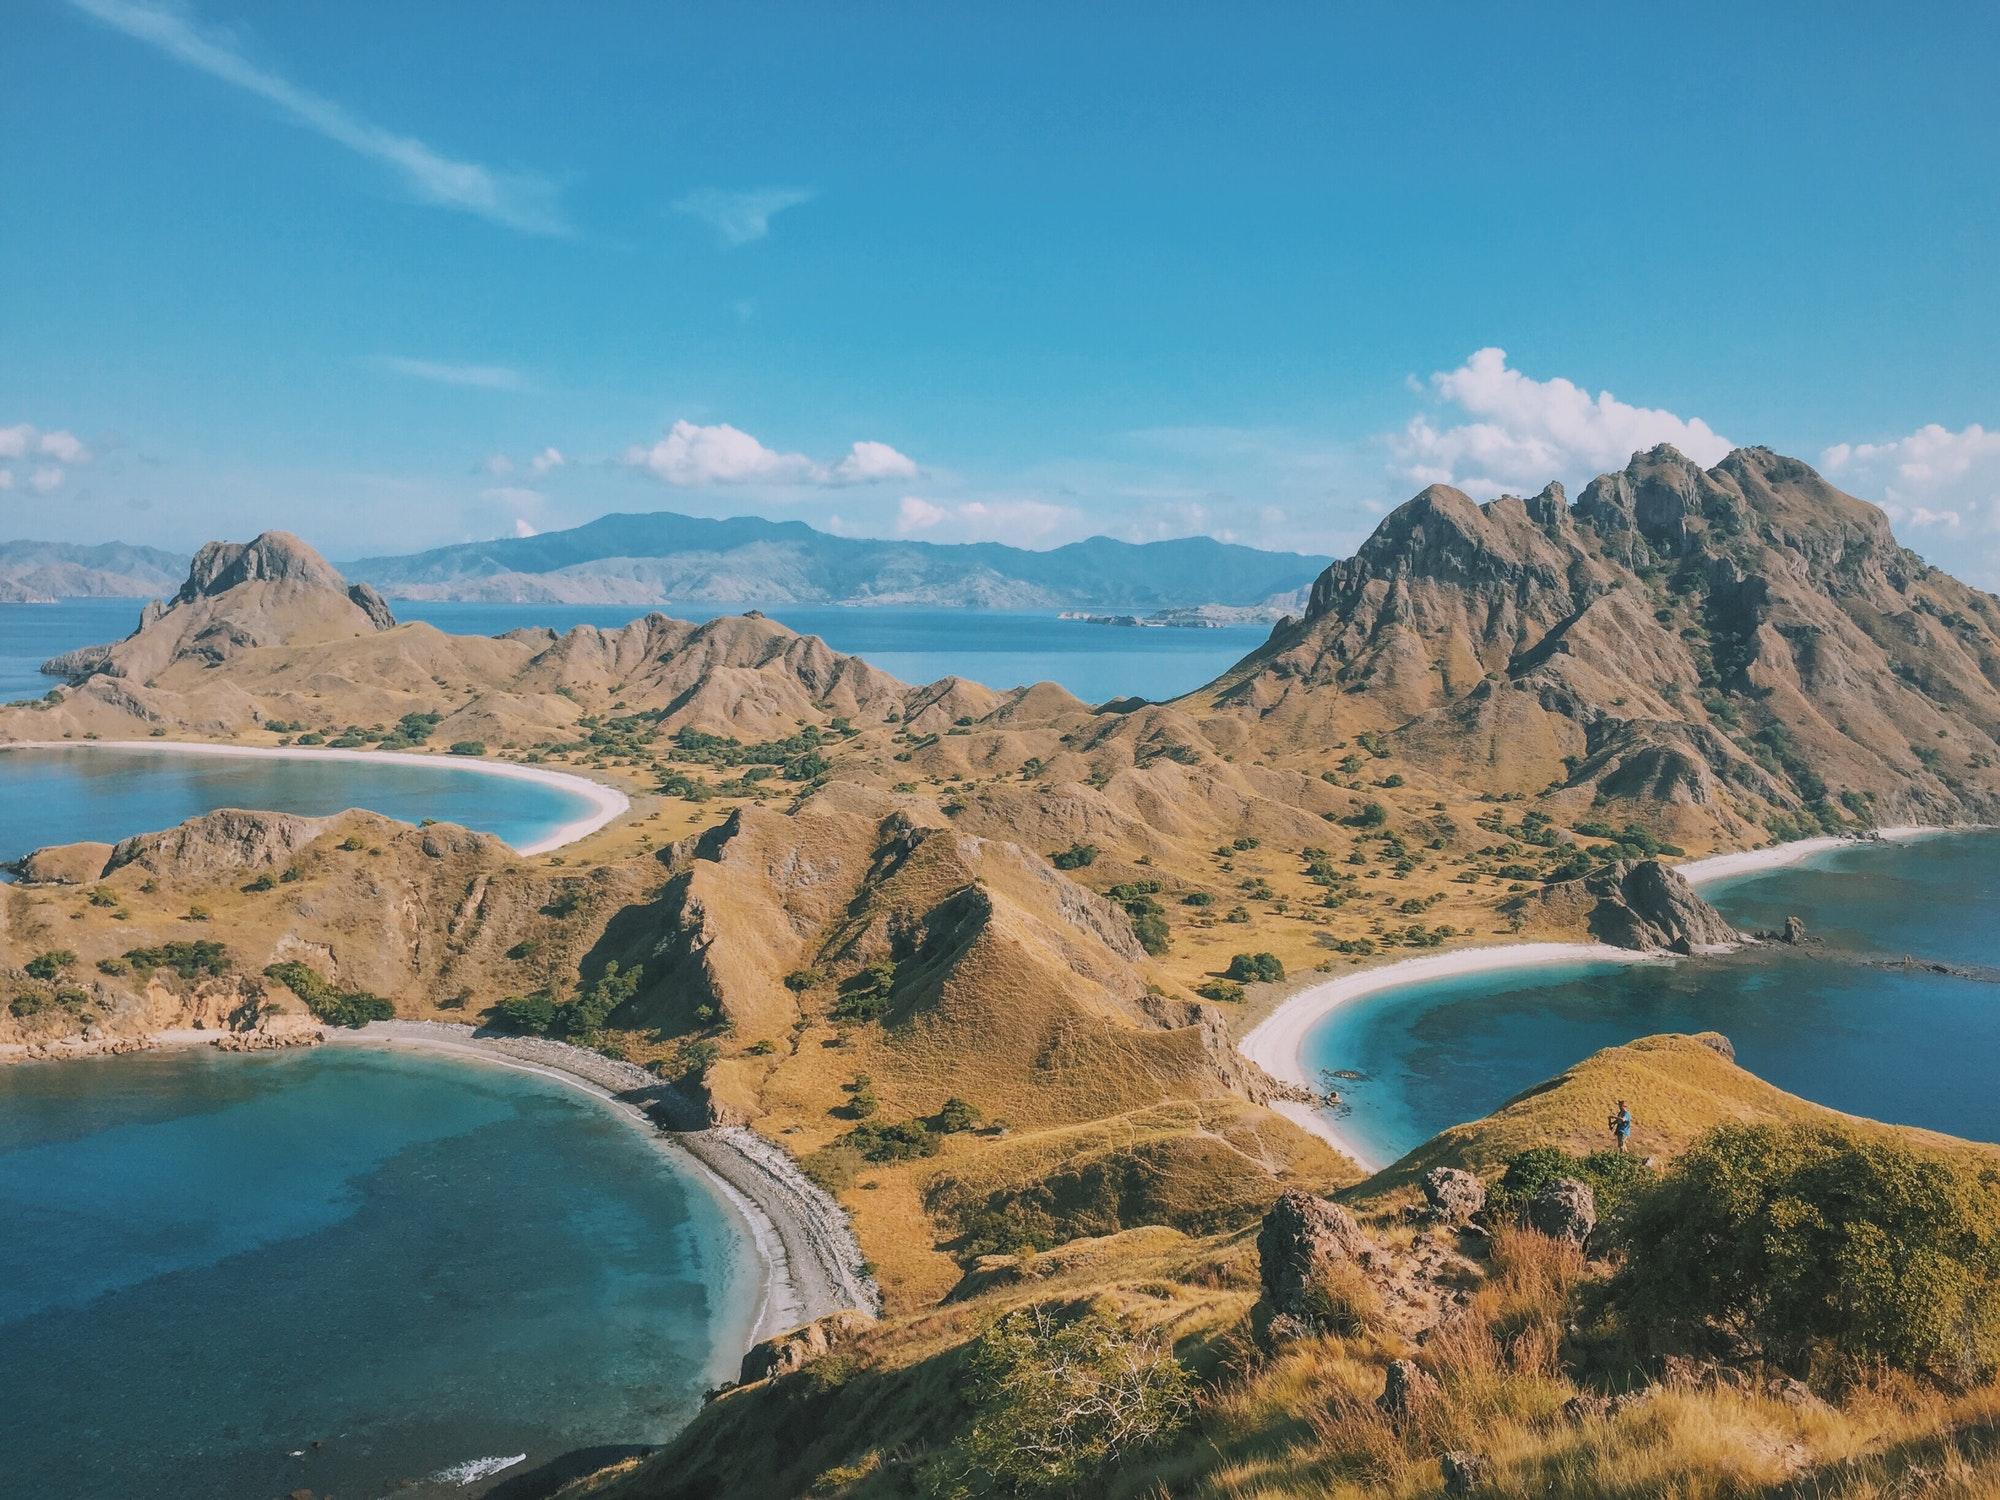 Padar Island, Labuan Bajo, Indonesia